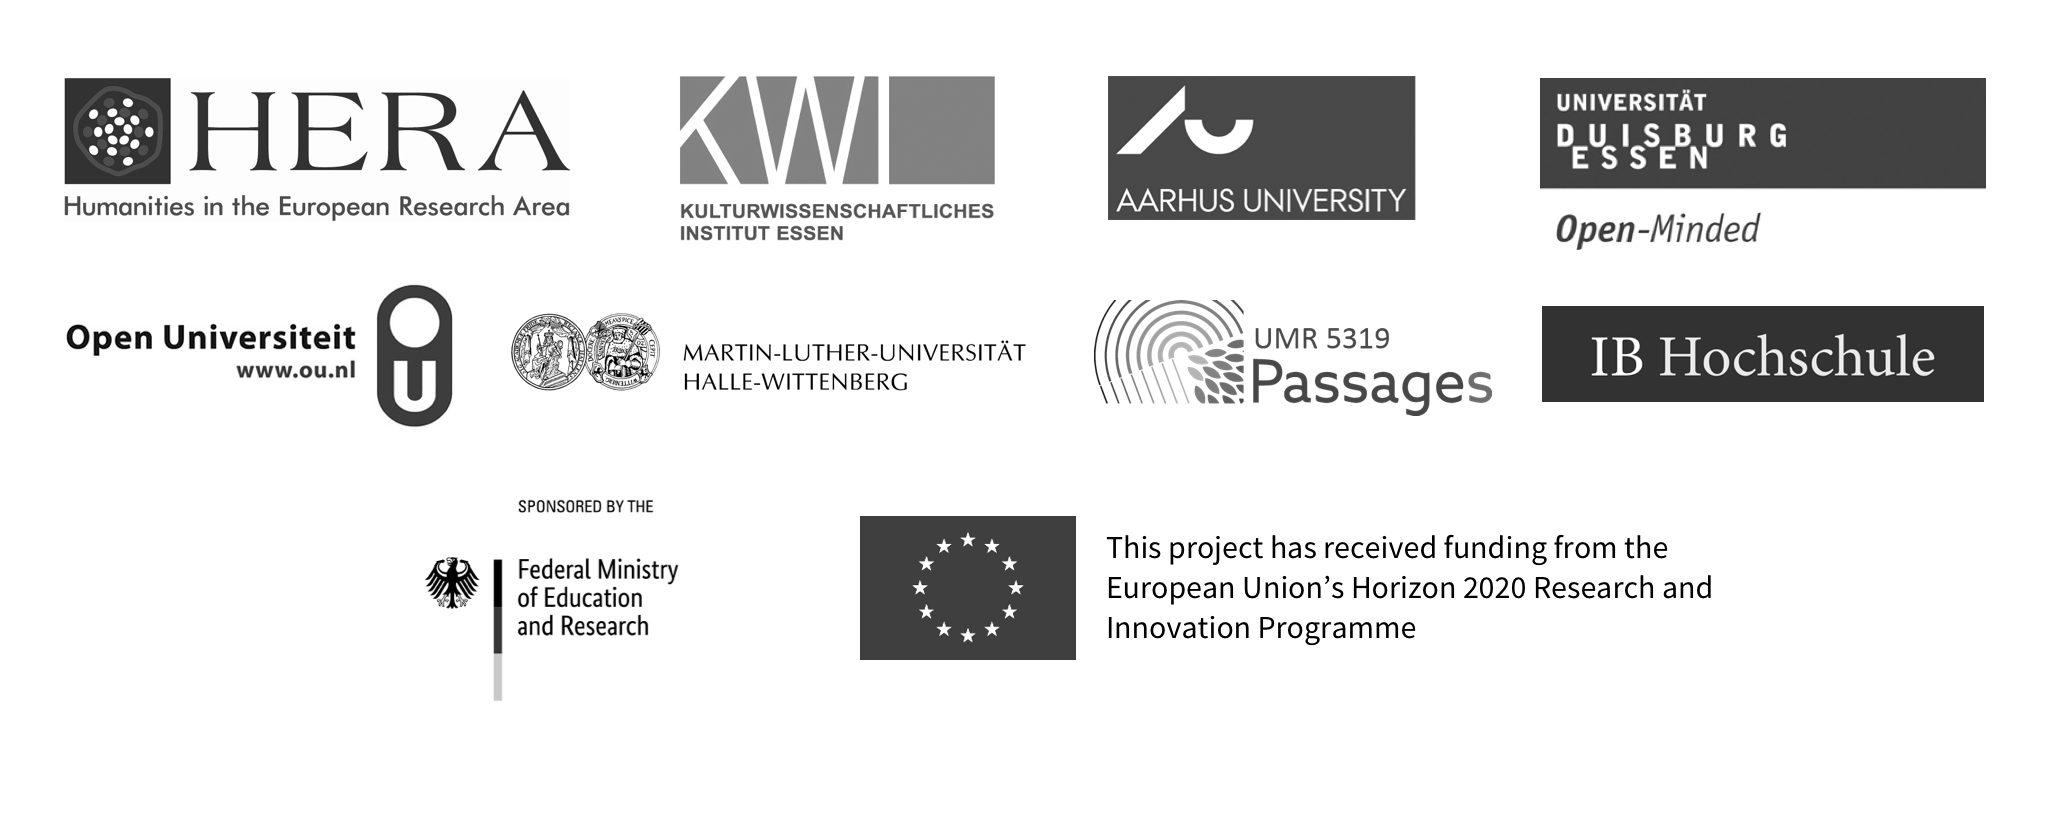 Narcotic City Partner Universities and Funding Logos 2021